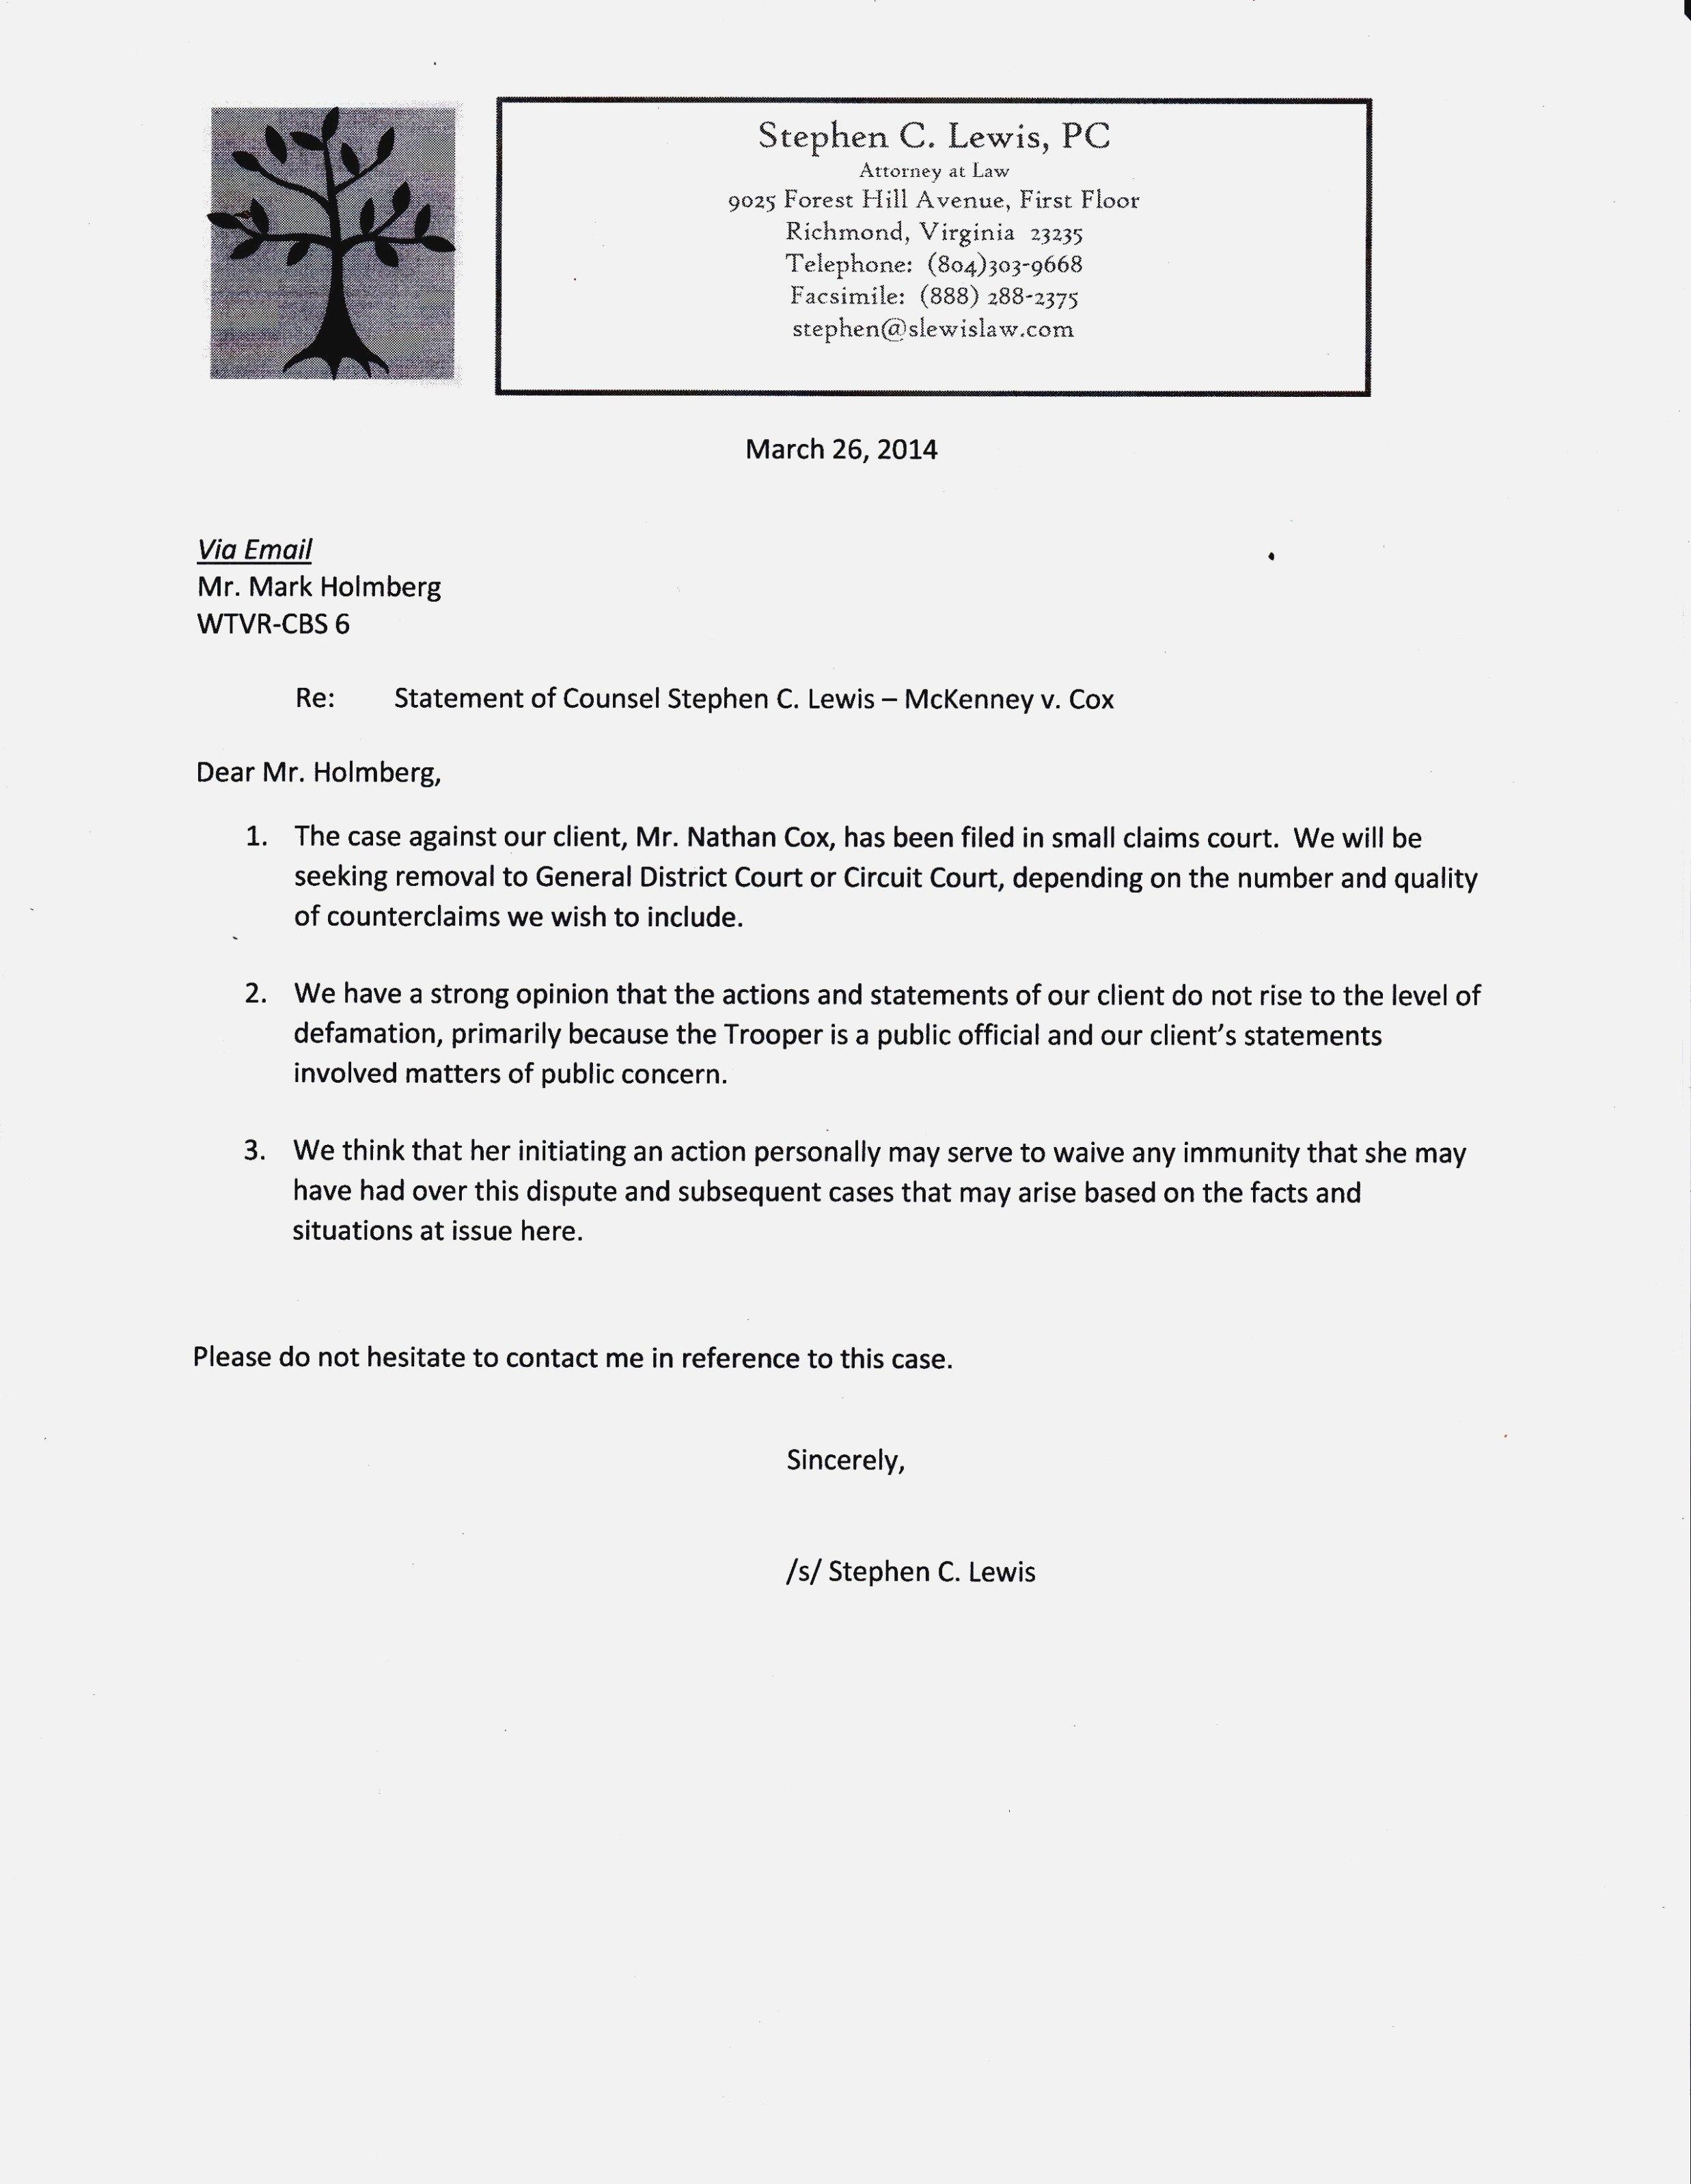 Employee Key Holder Agreement Form Original Va Cop Block Founder Regarding Key Holder Agreement Template